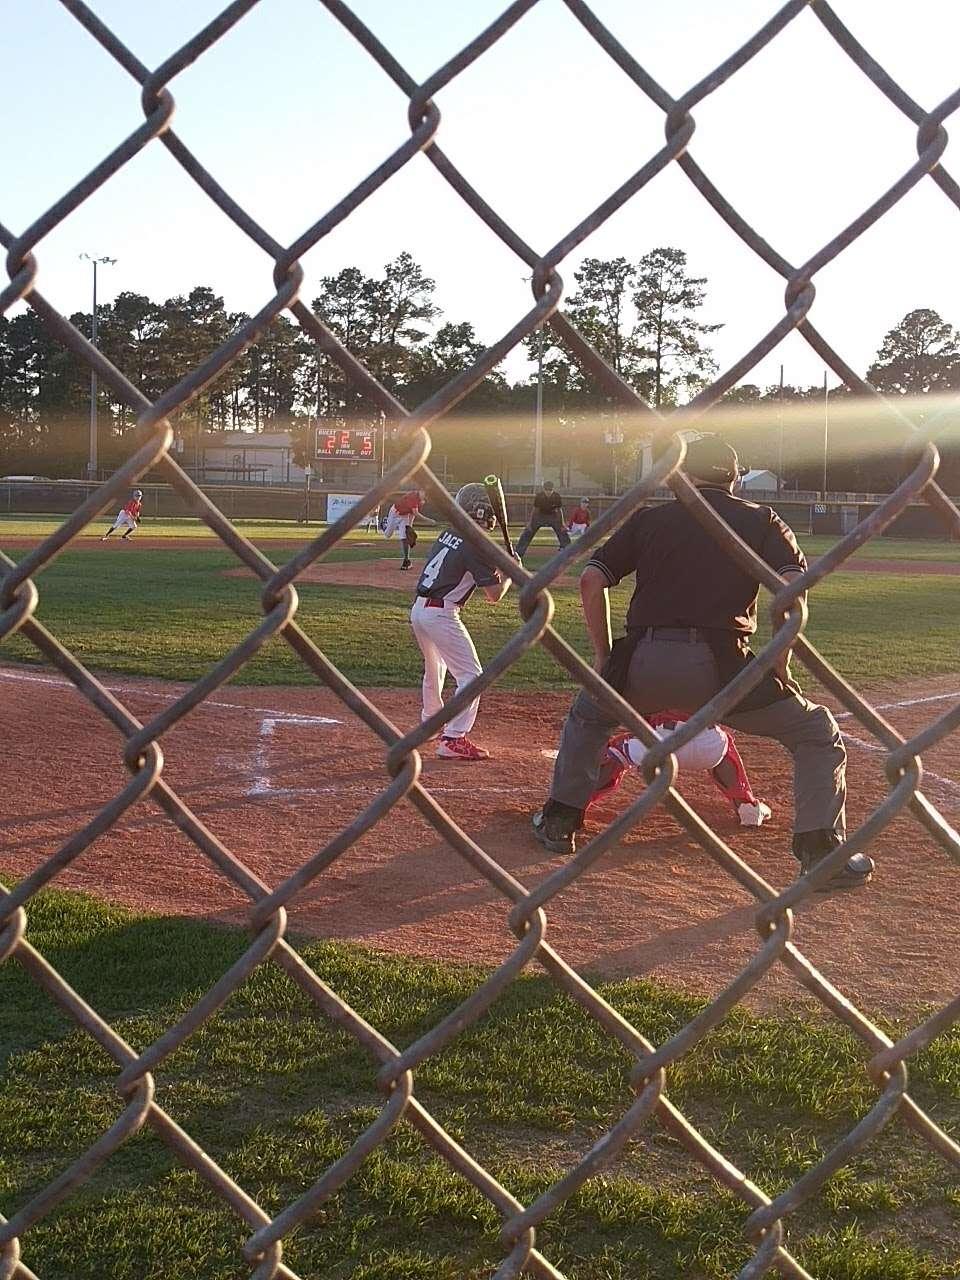 Rothwood Park Baseball - park    Photo 1 of 10   Address: 22430 Rothwood Rd, Spring, TX 77389, USA